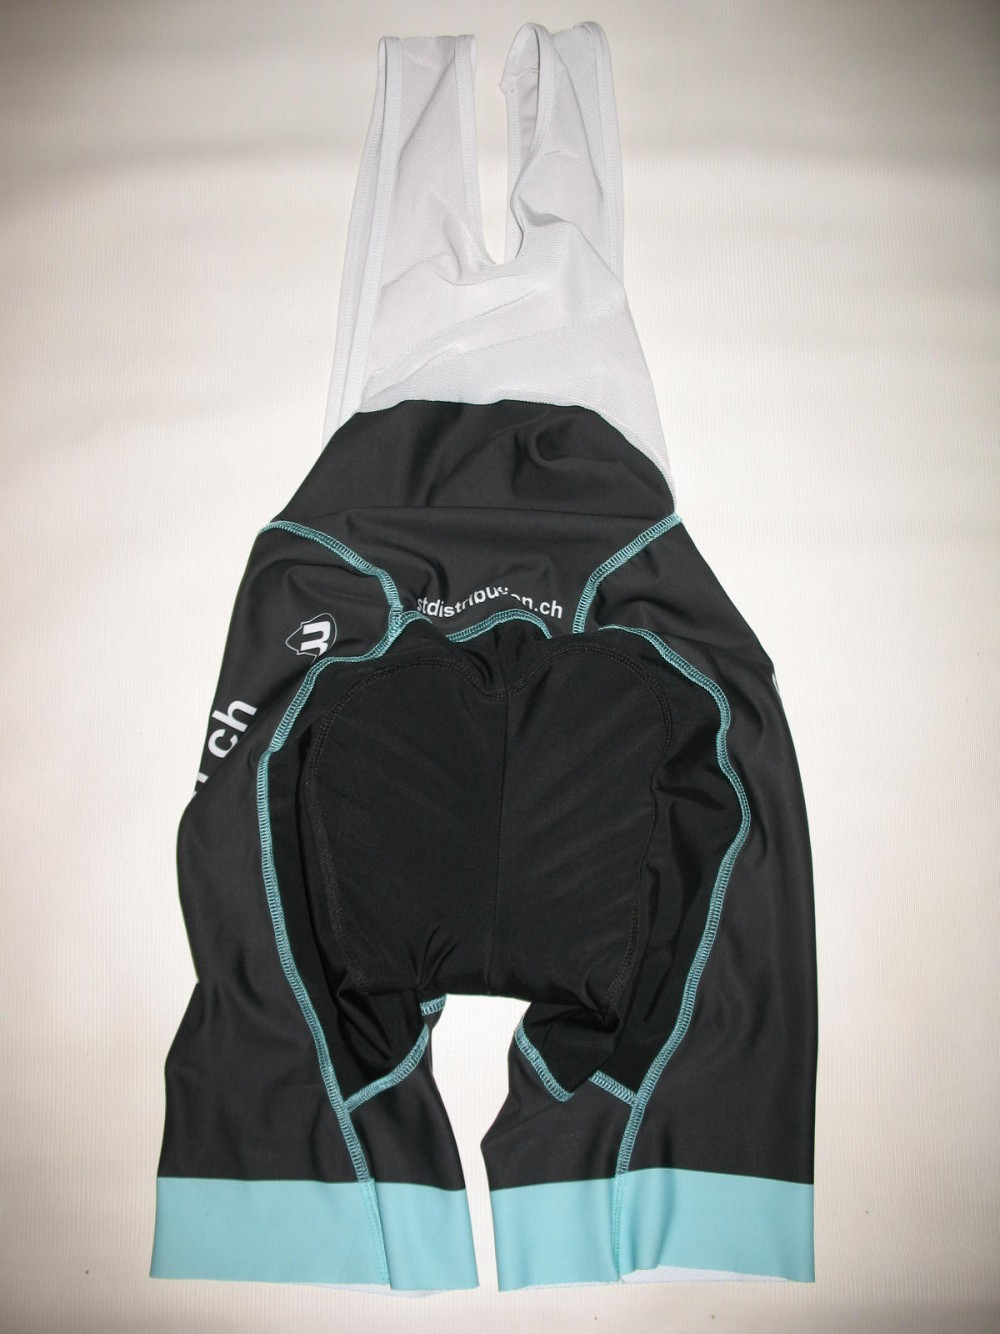 Велошорты VIFRA bib cycling shorts (размер М) - 2